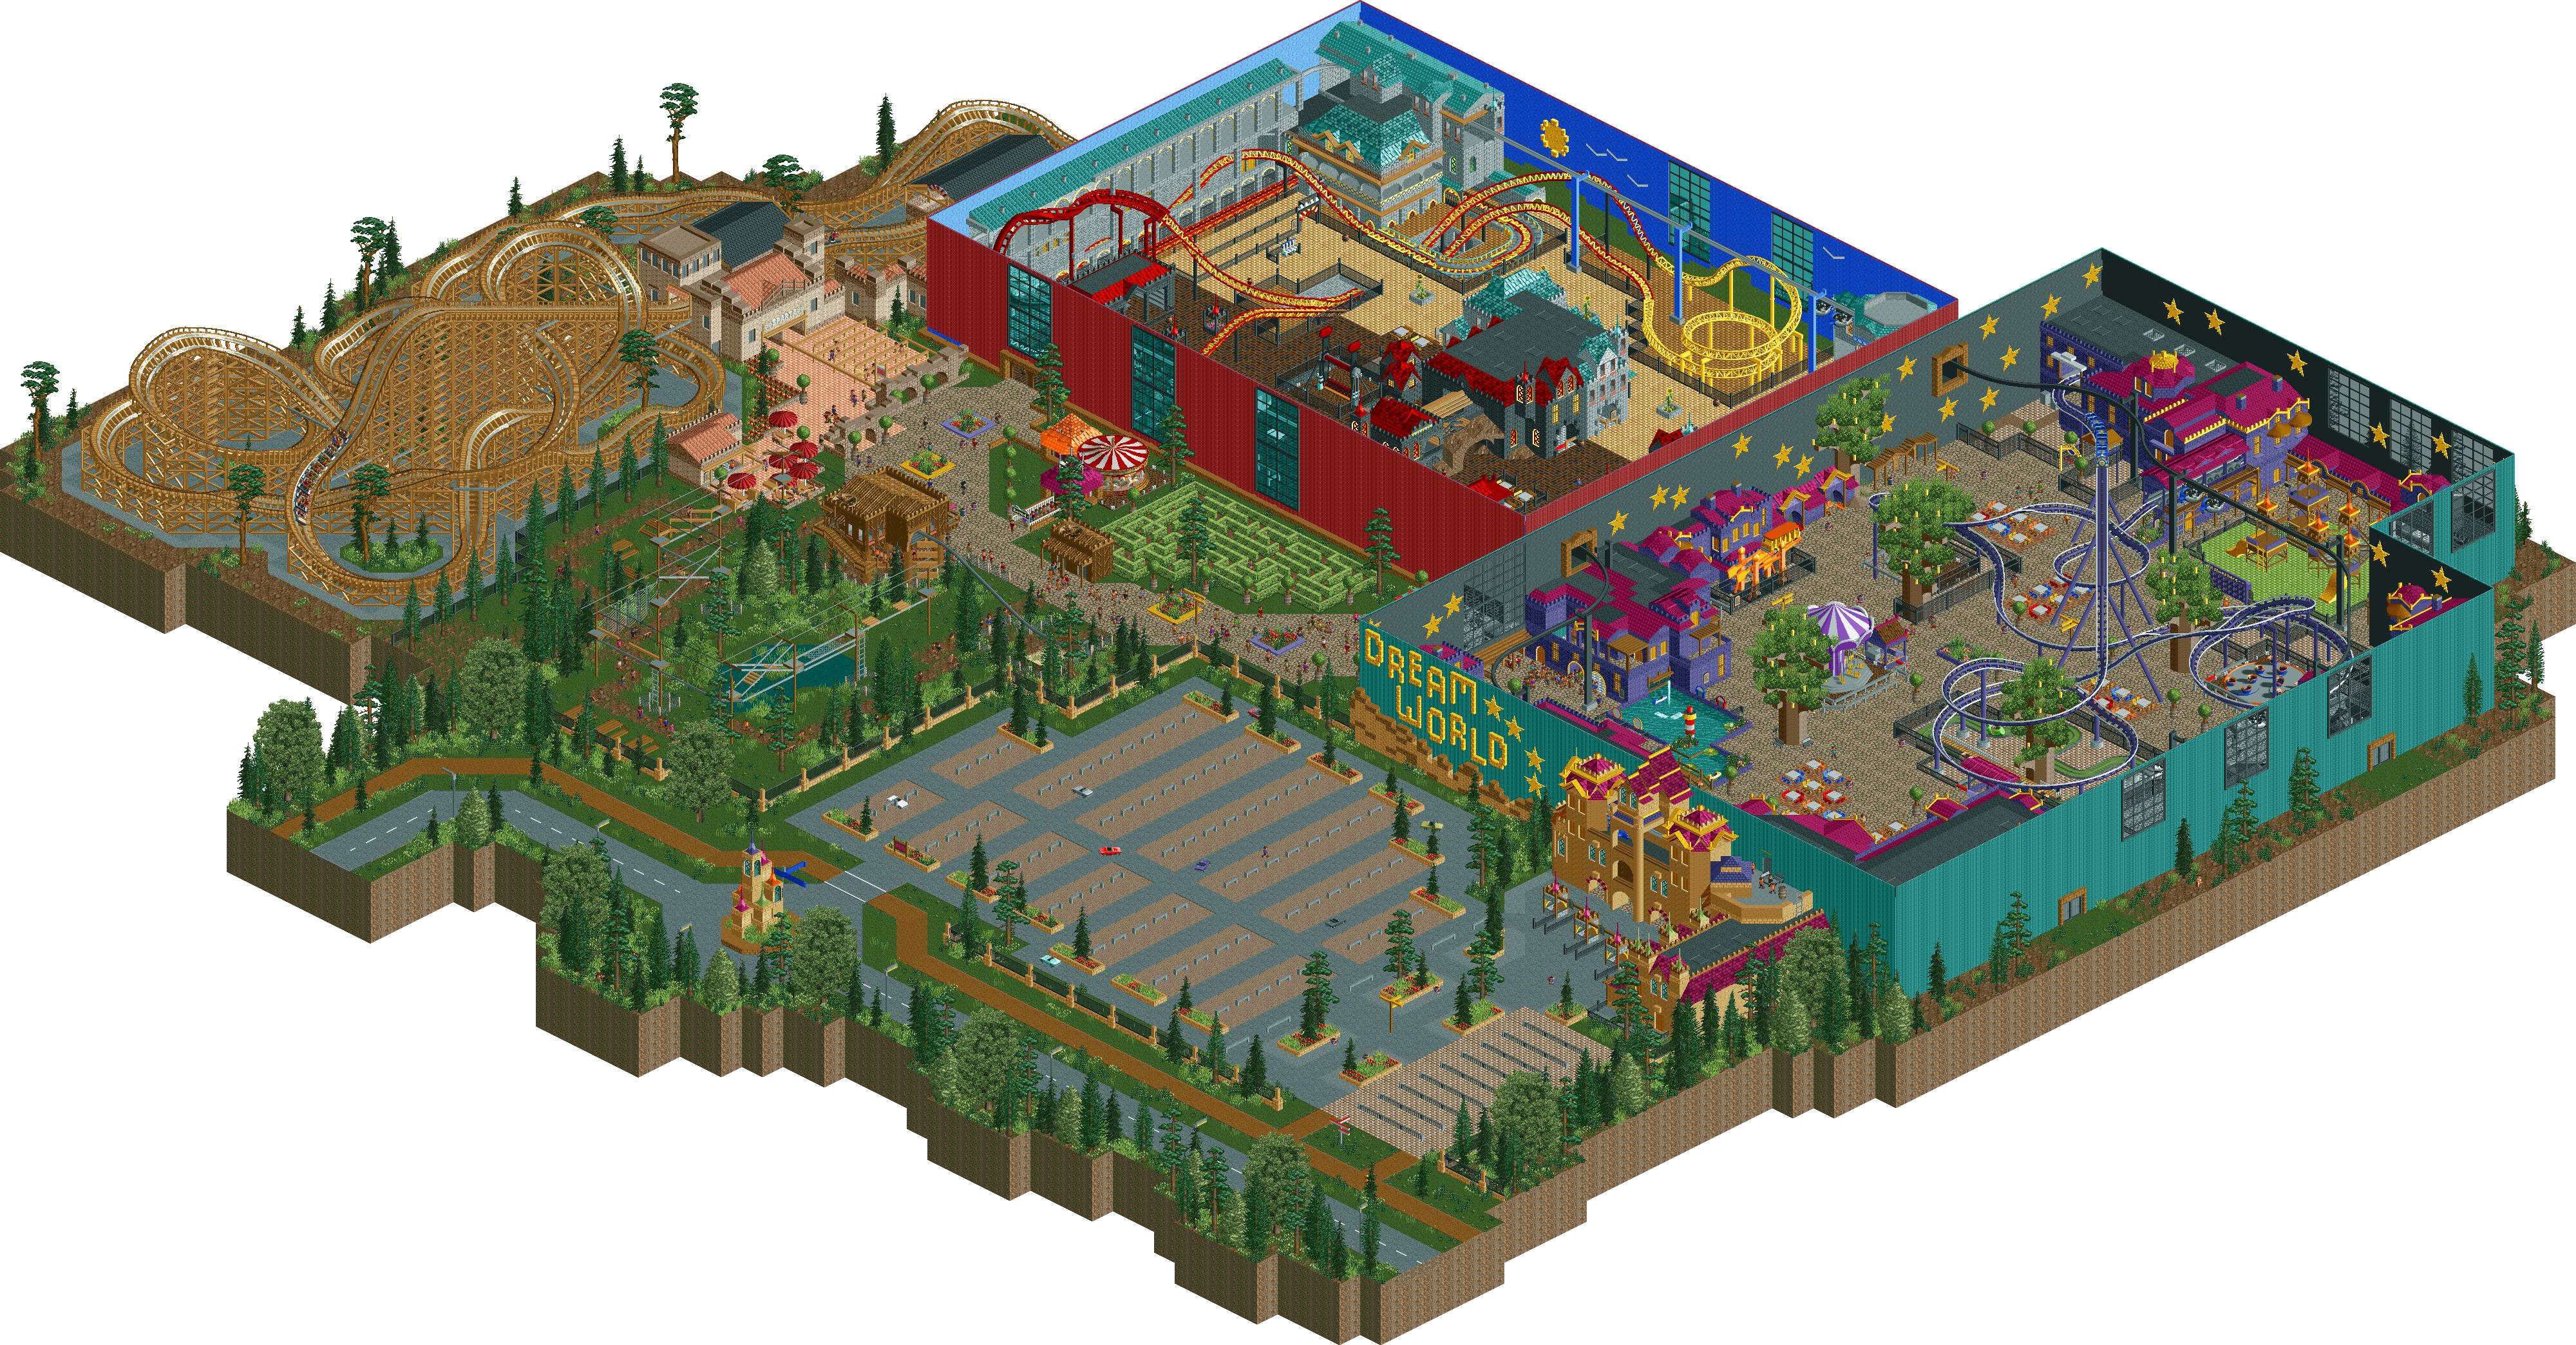 New Element - Park - Dream World Indoor